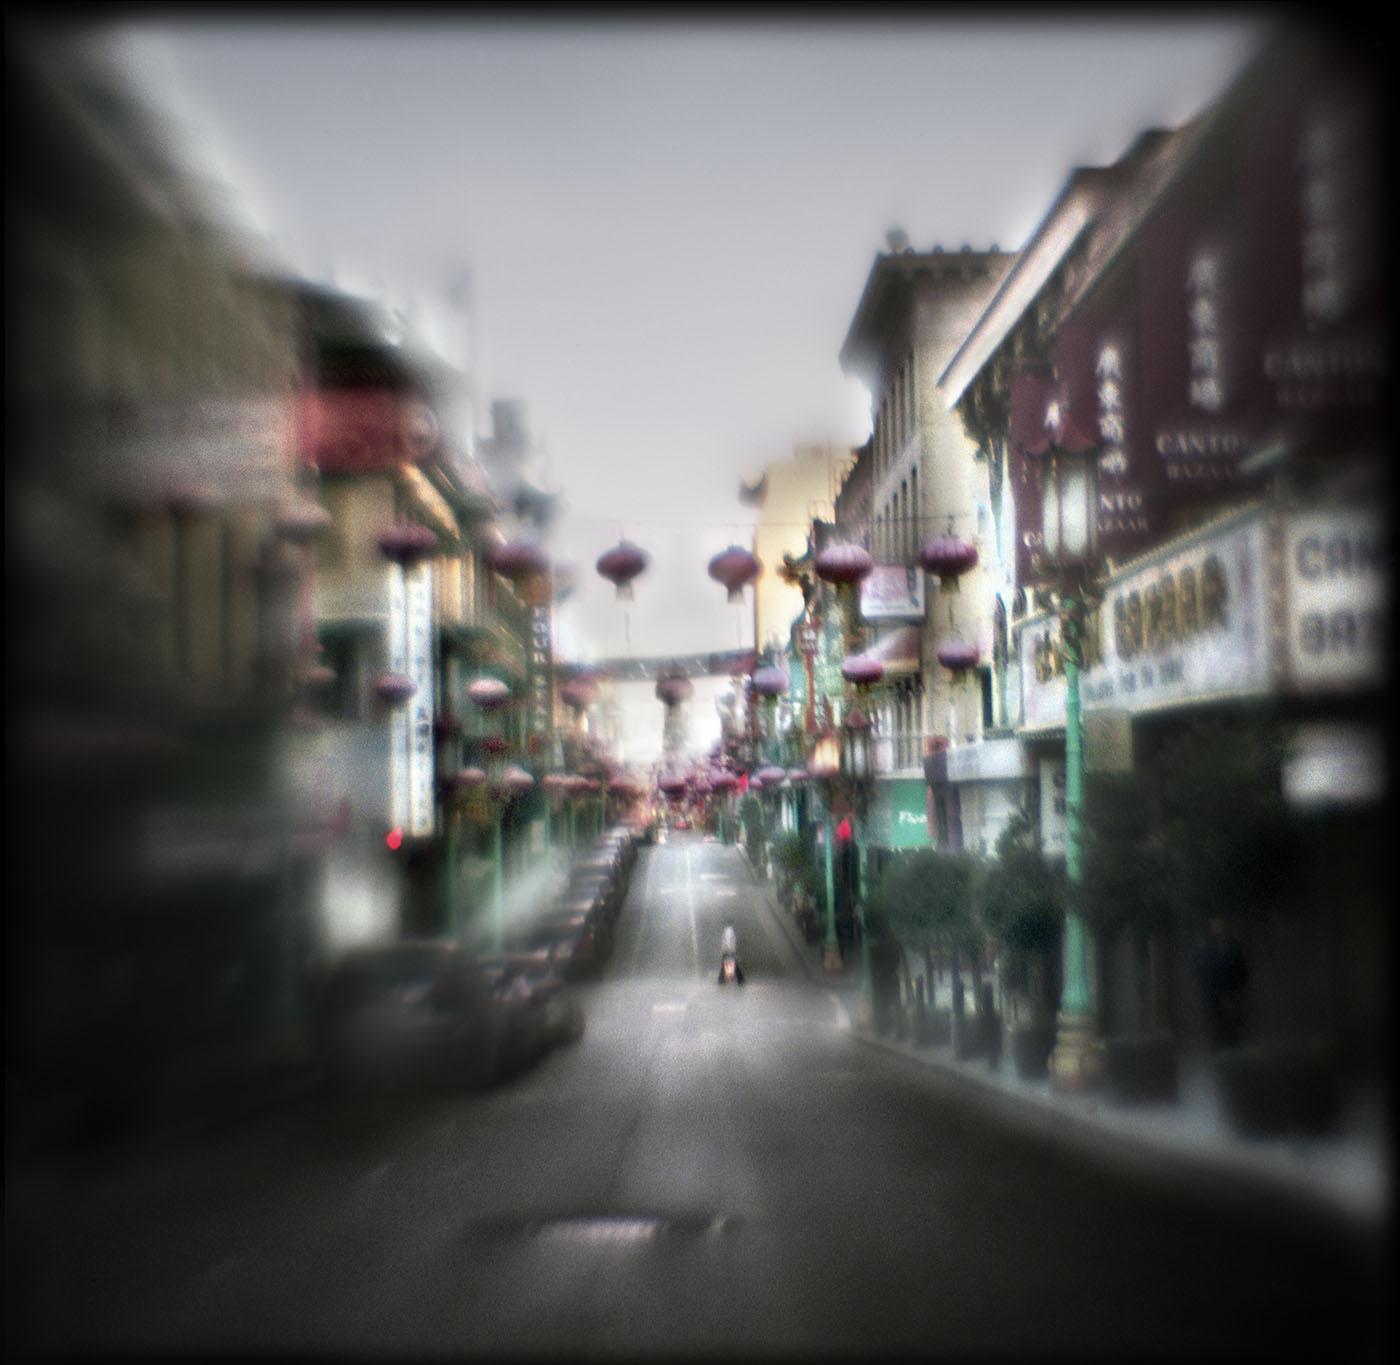 Daybreak, Grant Street